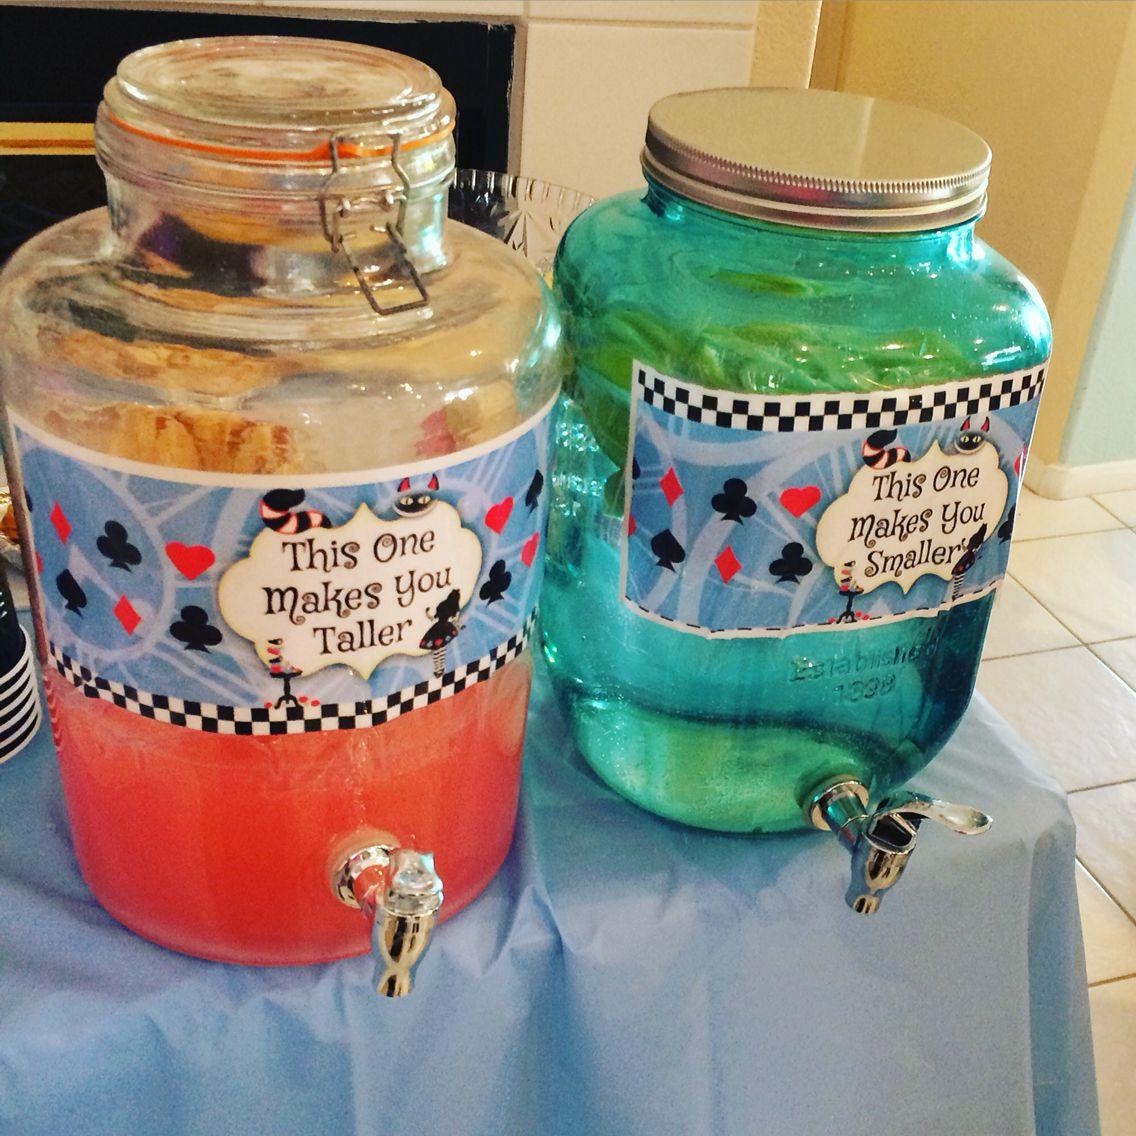 Alice in Wonderland Mad Hatter tea party                                                                                                                                                                                 More